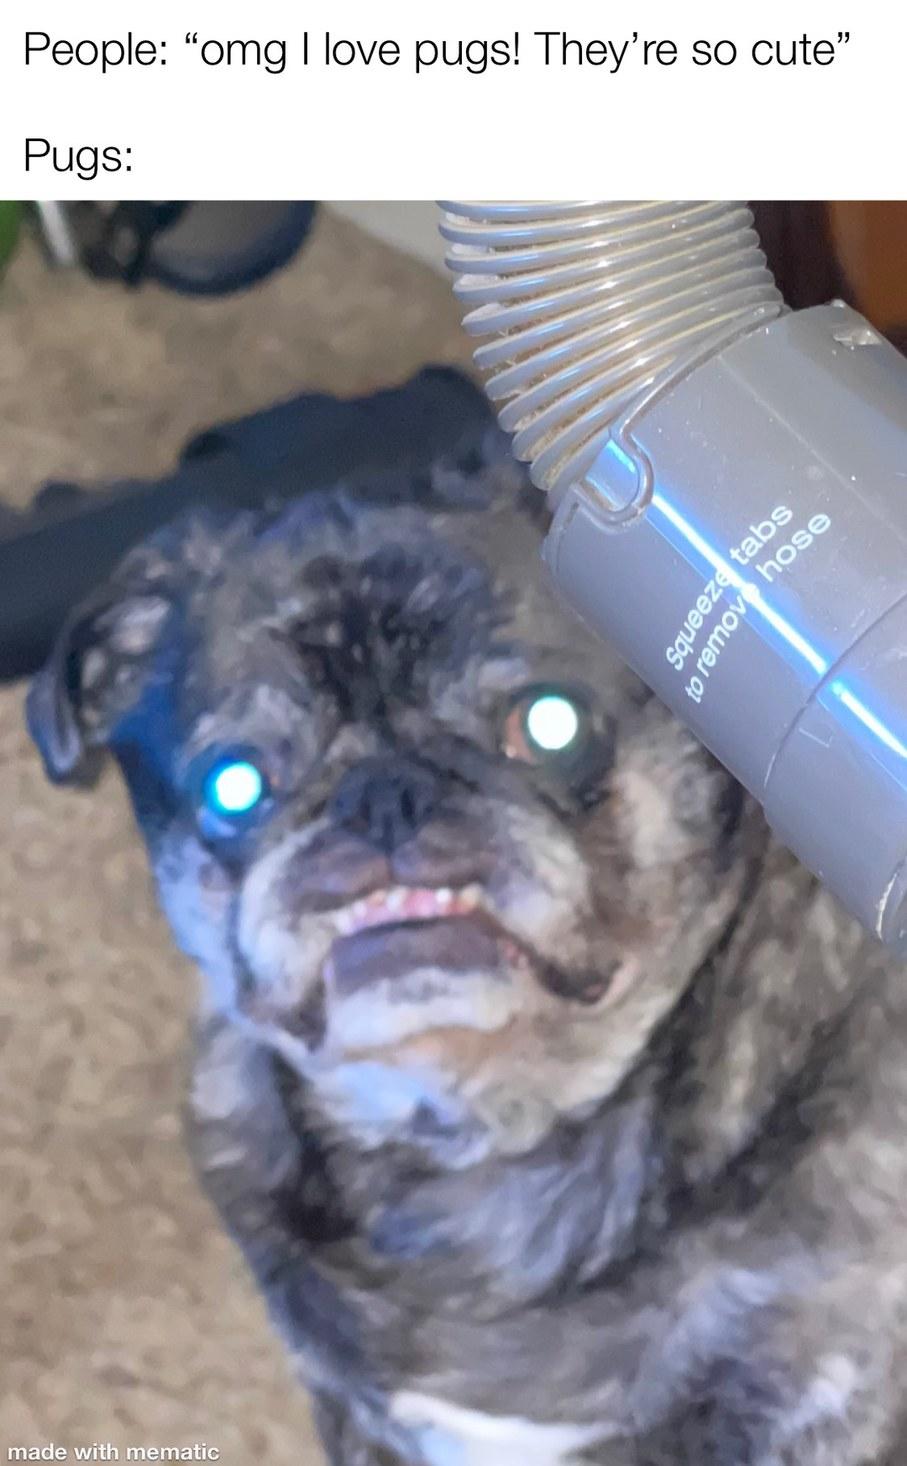 pugs be like - meme